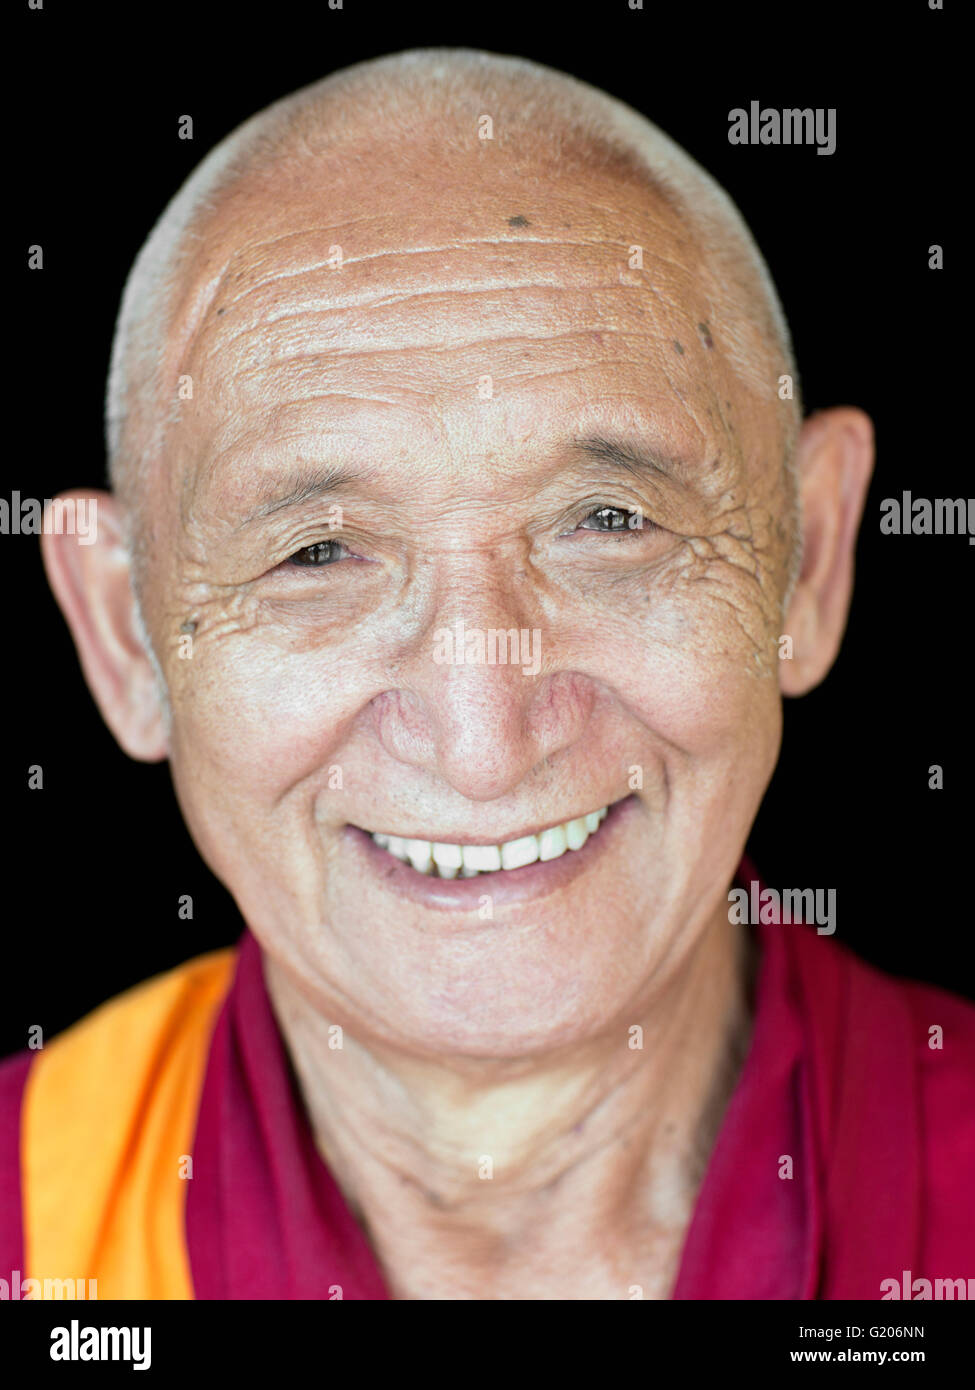 A portrait of Tibetan Monk and Buddhist philosophy teacher Geshe Sonam Rinchen. - Stock Image